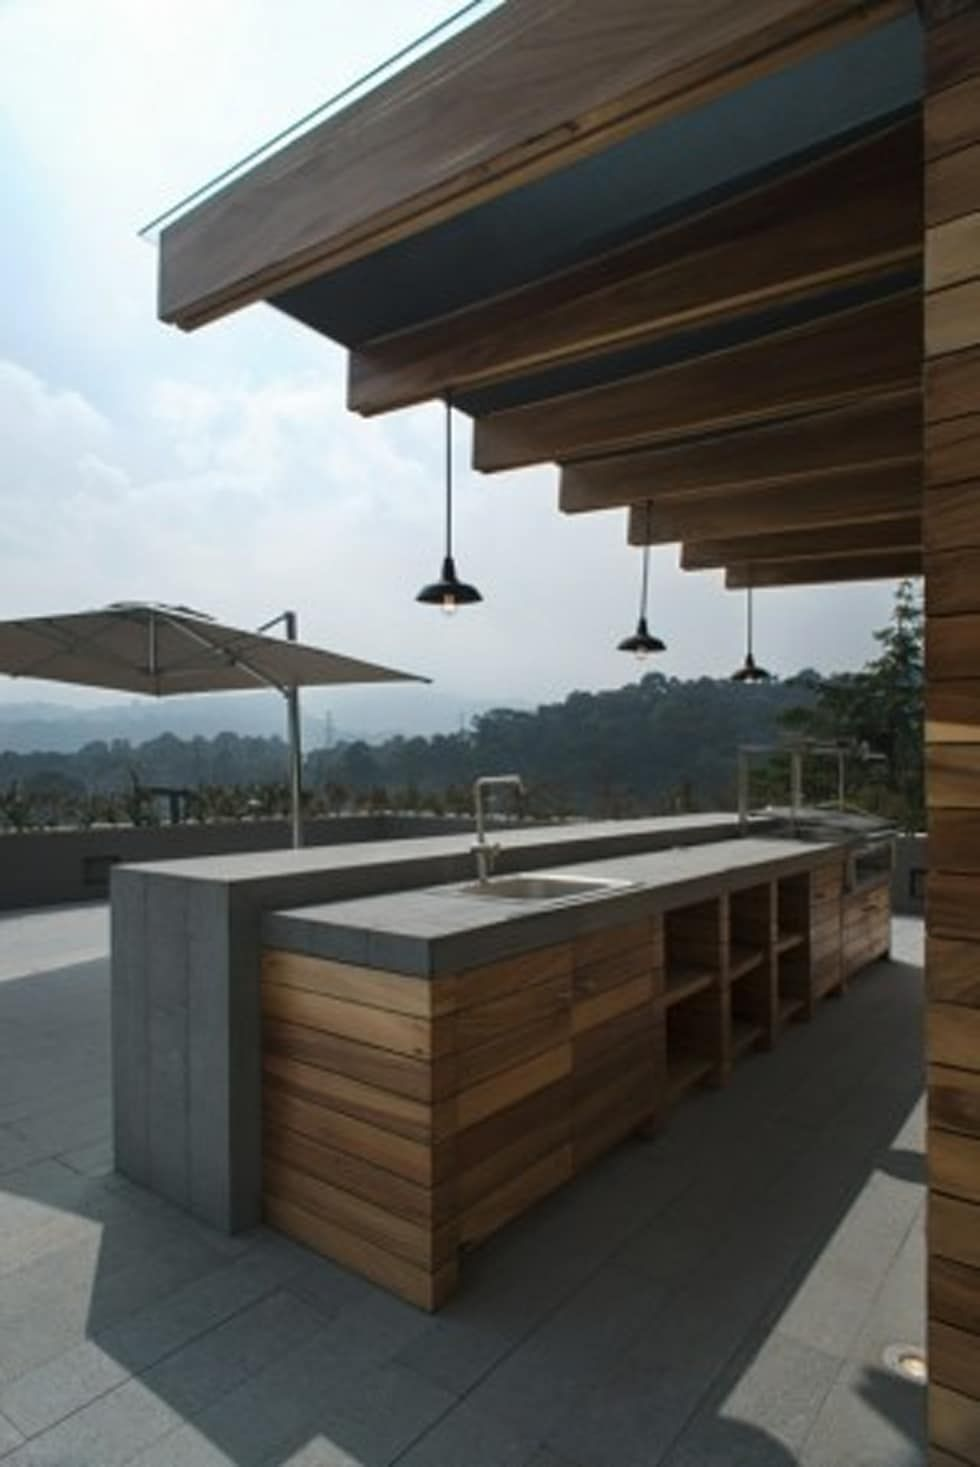 45 Ideas Rooftop Deck Design Roof Garden Professional Outdoor Kitchen Design Outdoor Kitchen Roof Garden